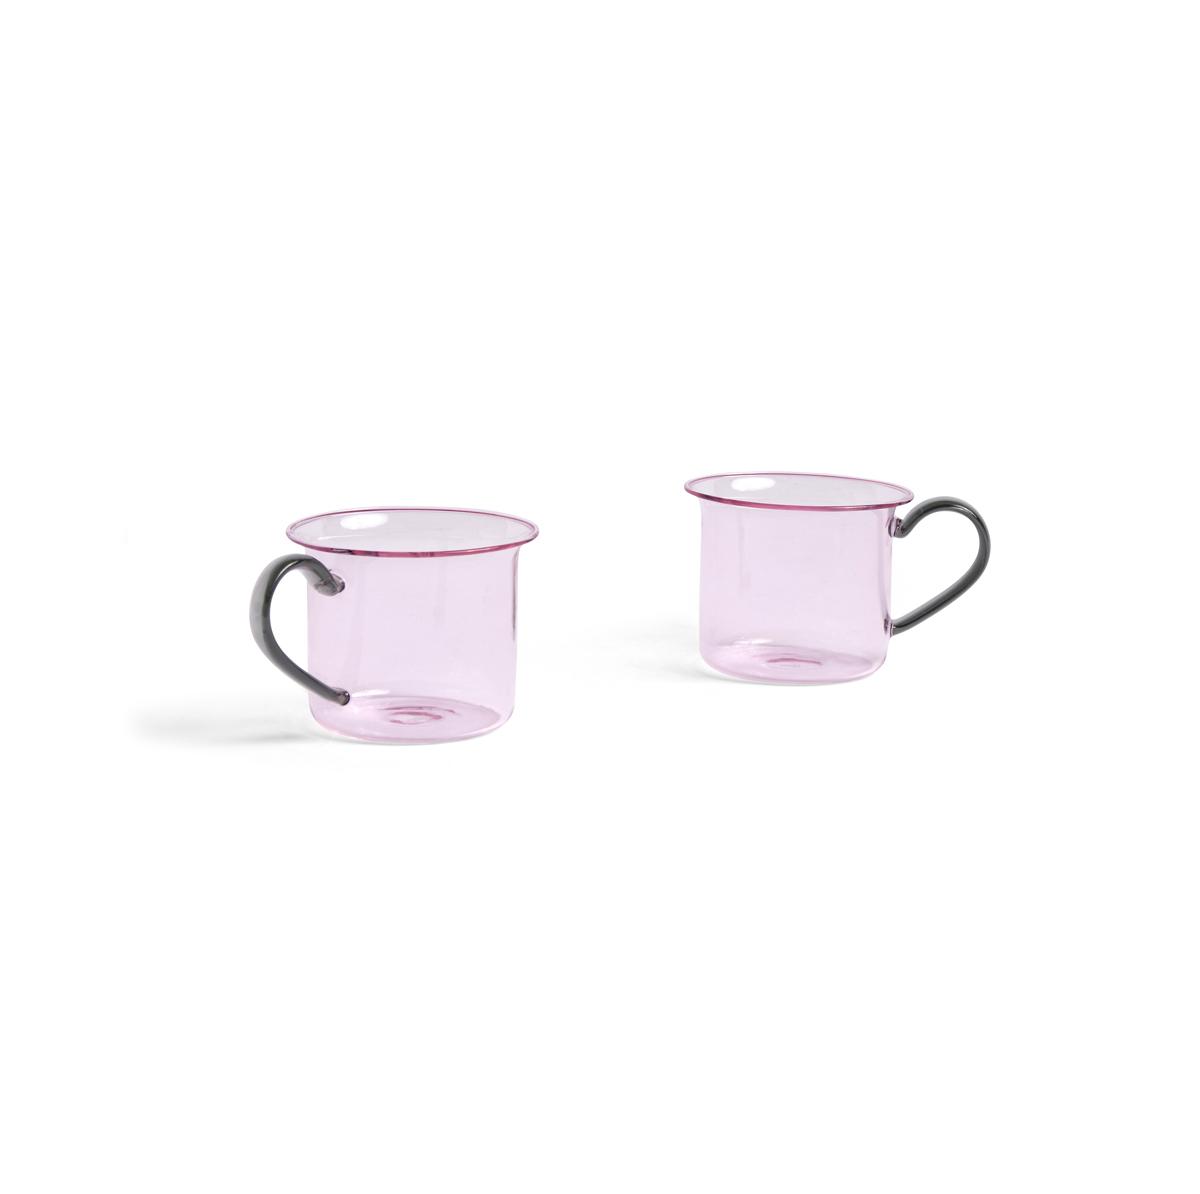 HAY Set de 2 tasses borosilicate rose